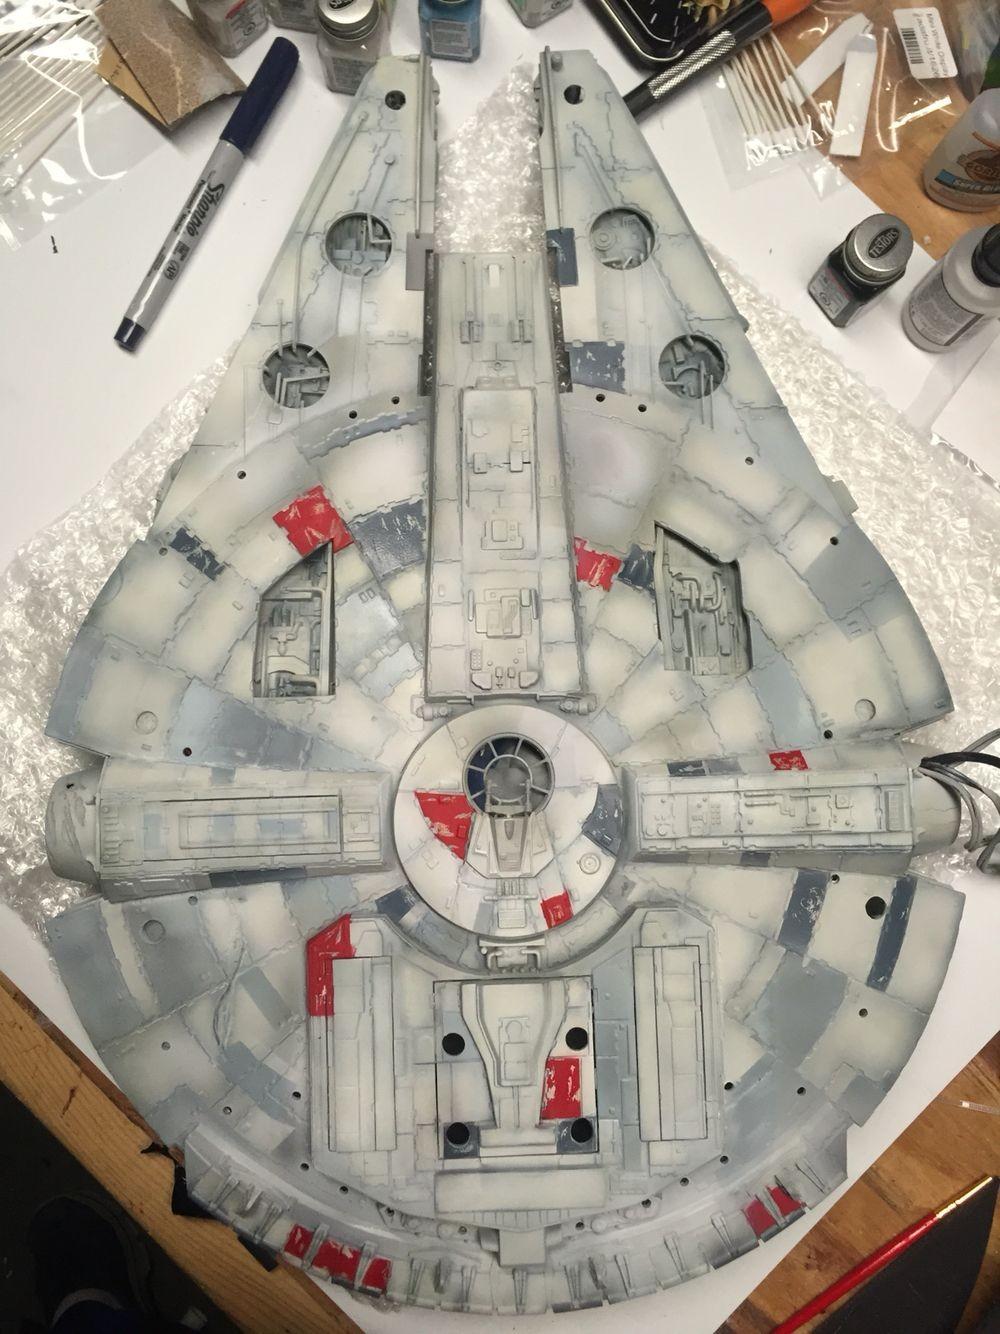 Millenium Falcon Papercraft Base Coat On the Bottom Half Of the Falcon Plete